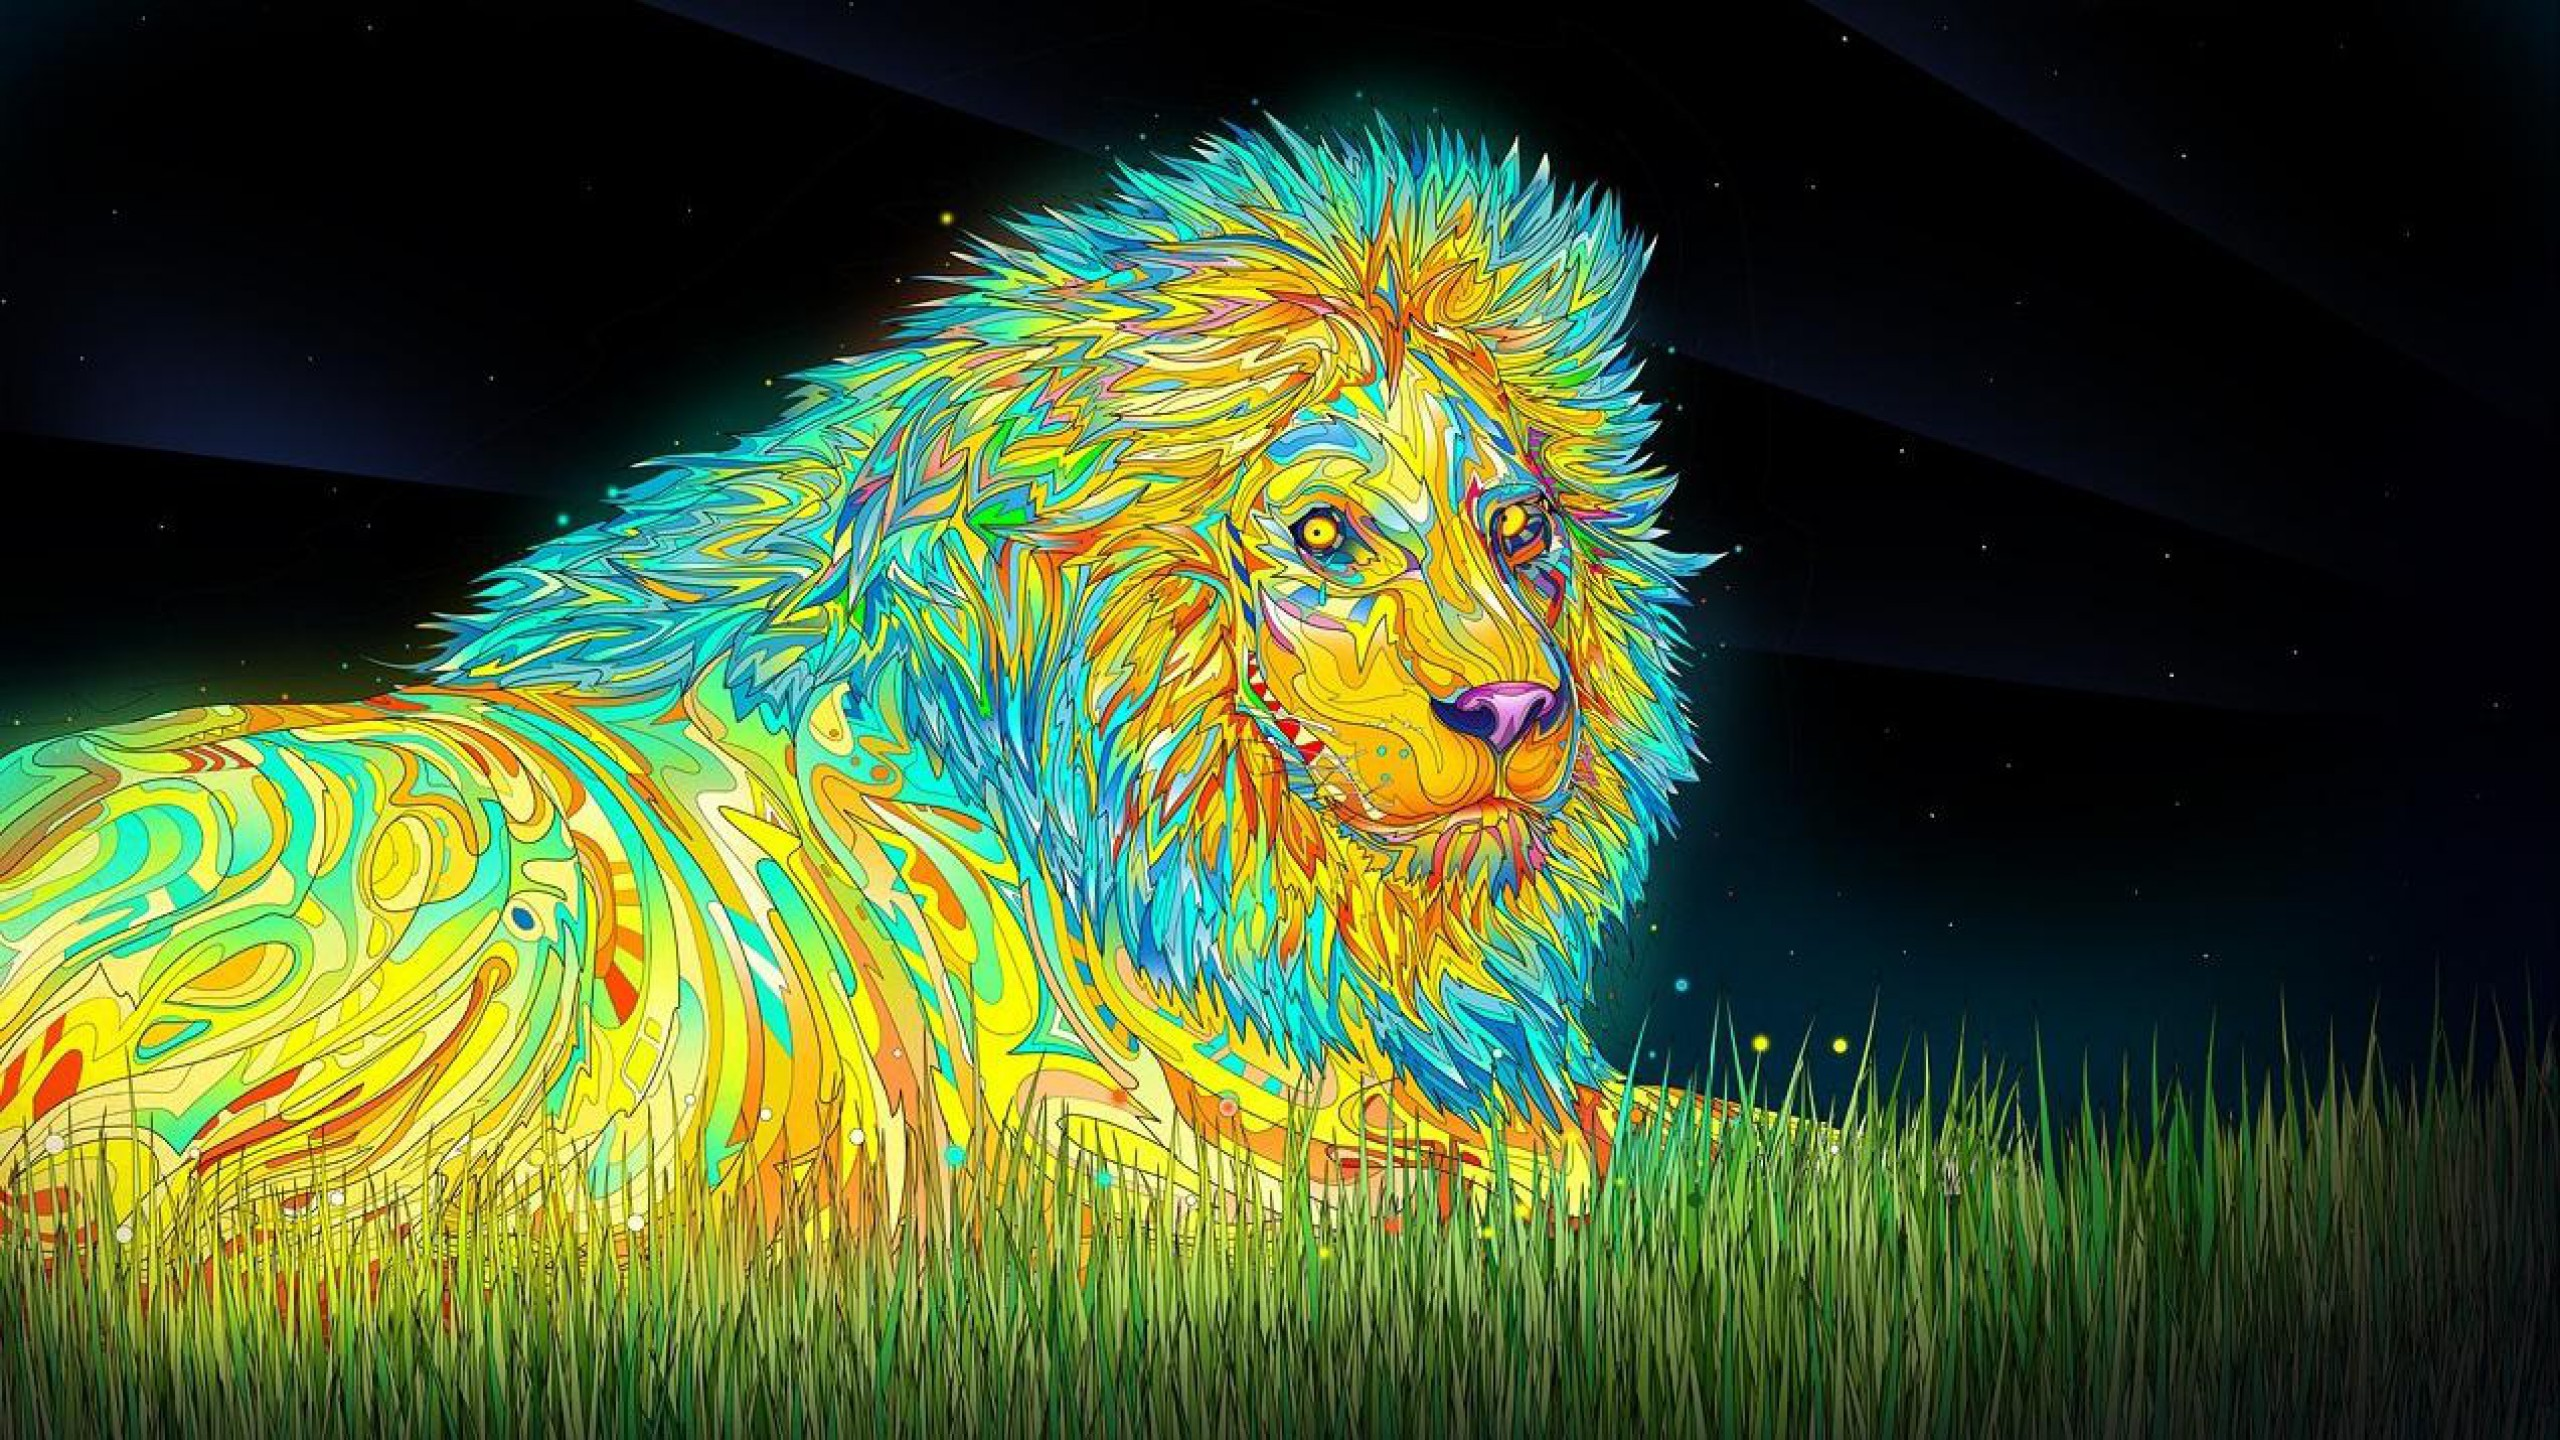 Rasta Lion Wallpaper Iphone Trippy Rasta Wallpaper 47 Images